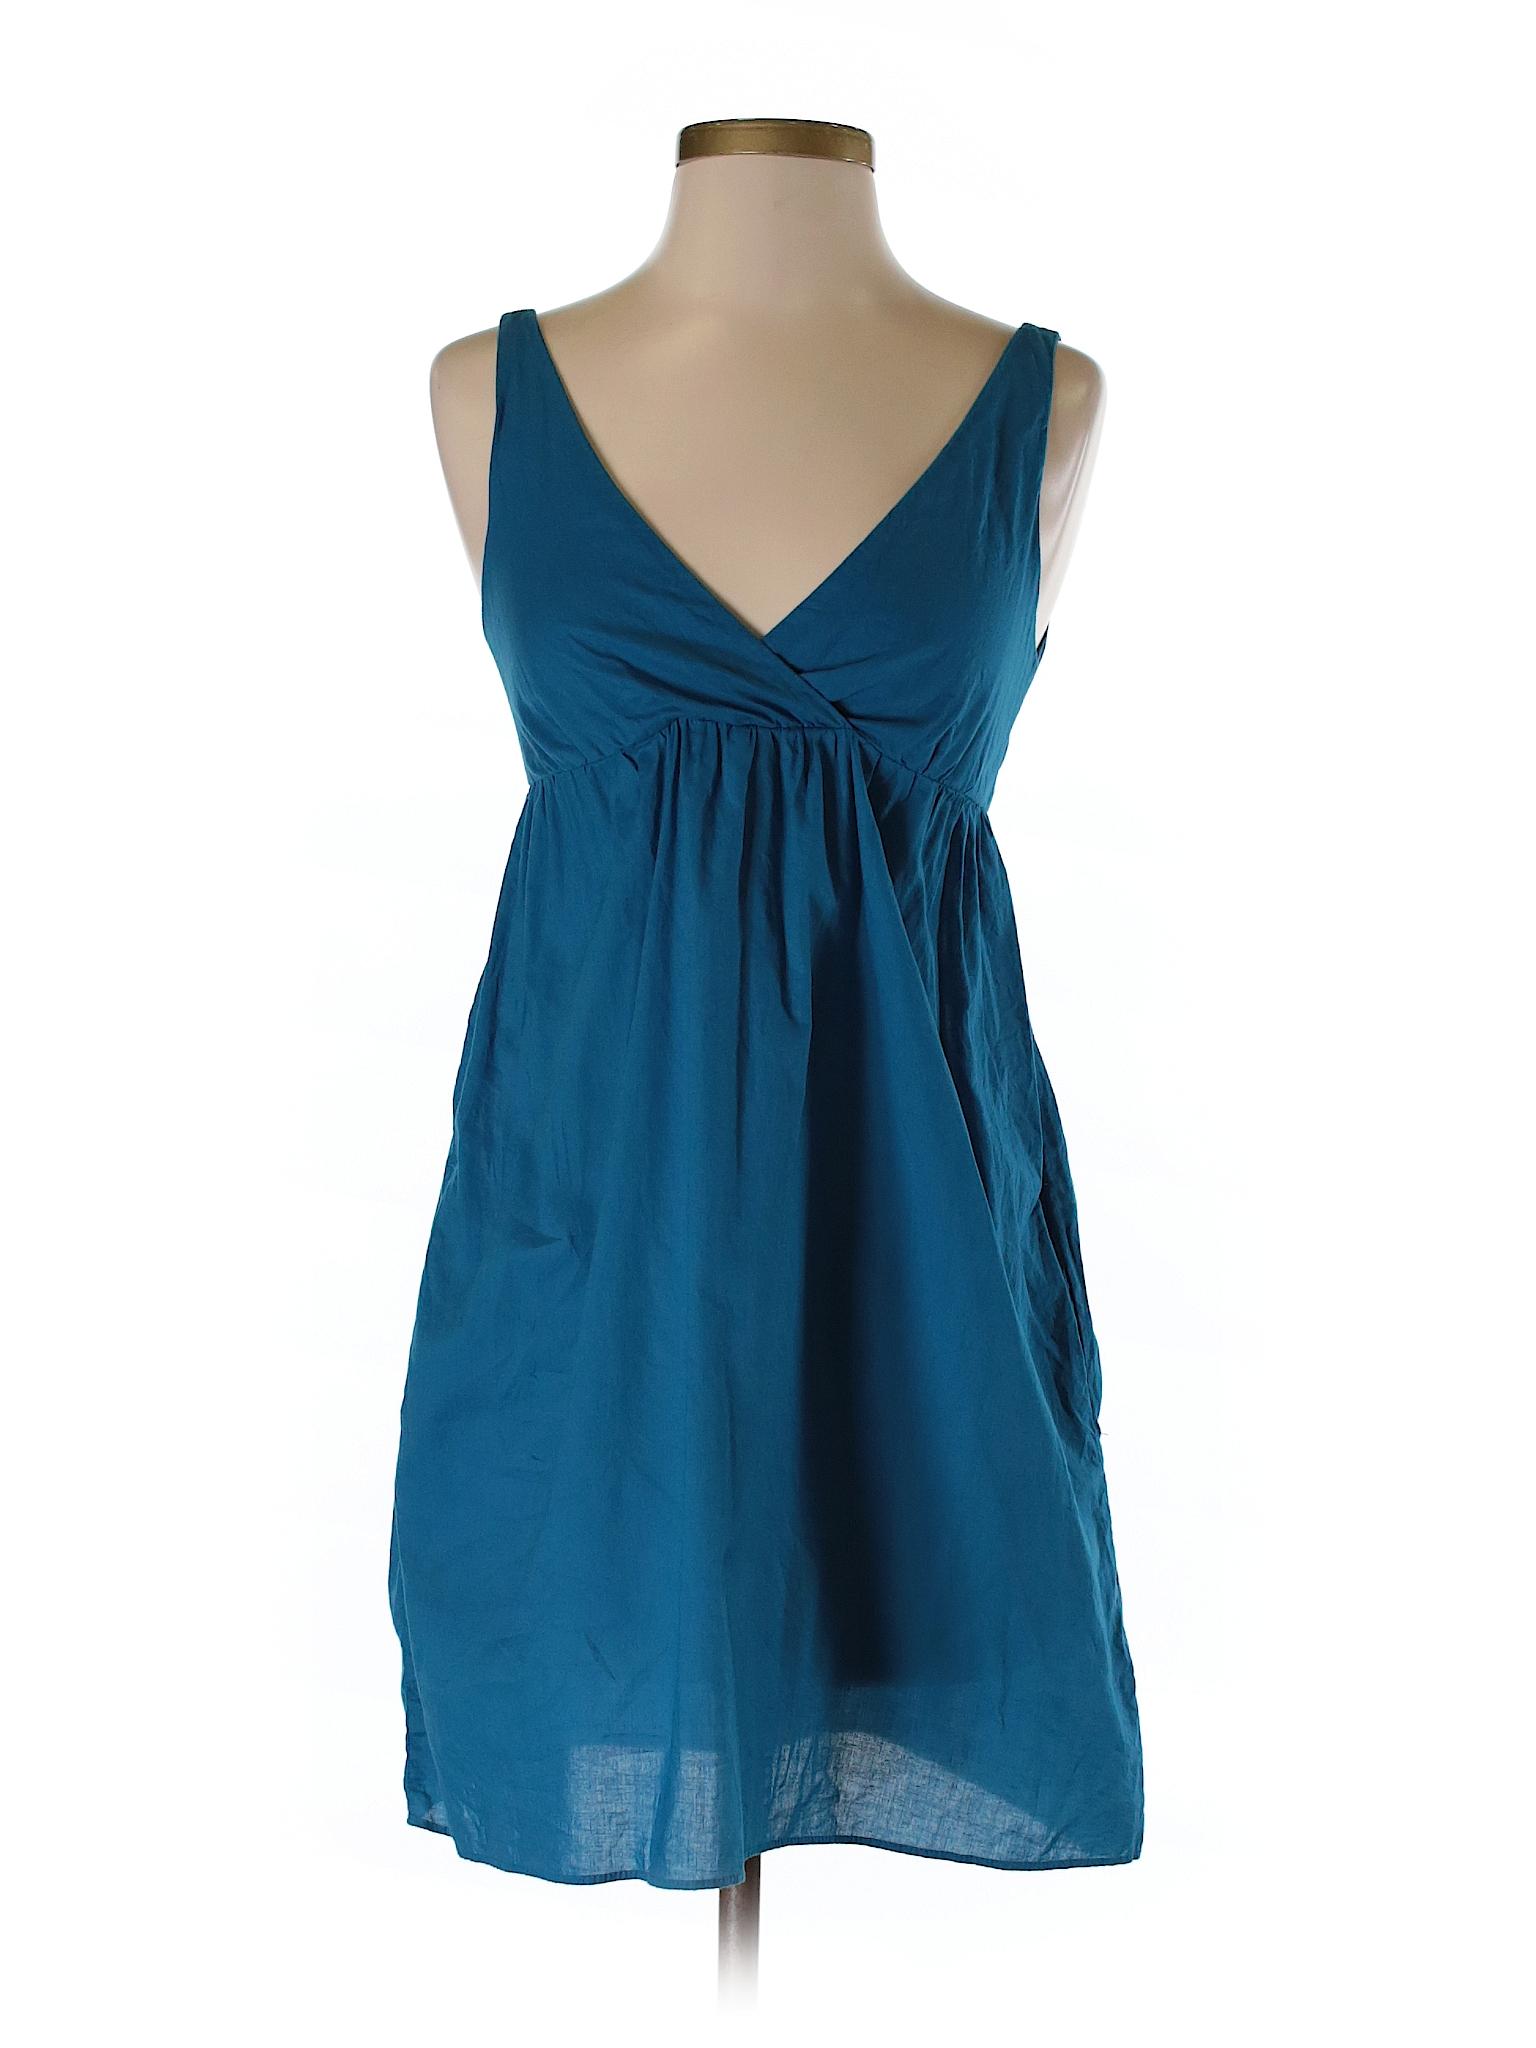 Dress Old Navy winter Casual Boutique qB7Sxavwn